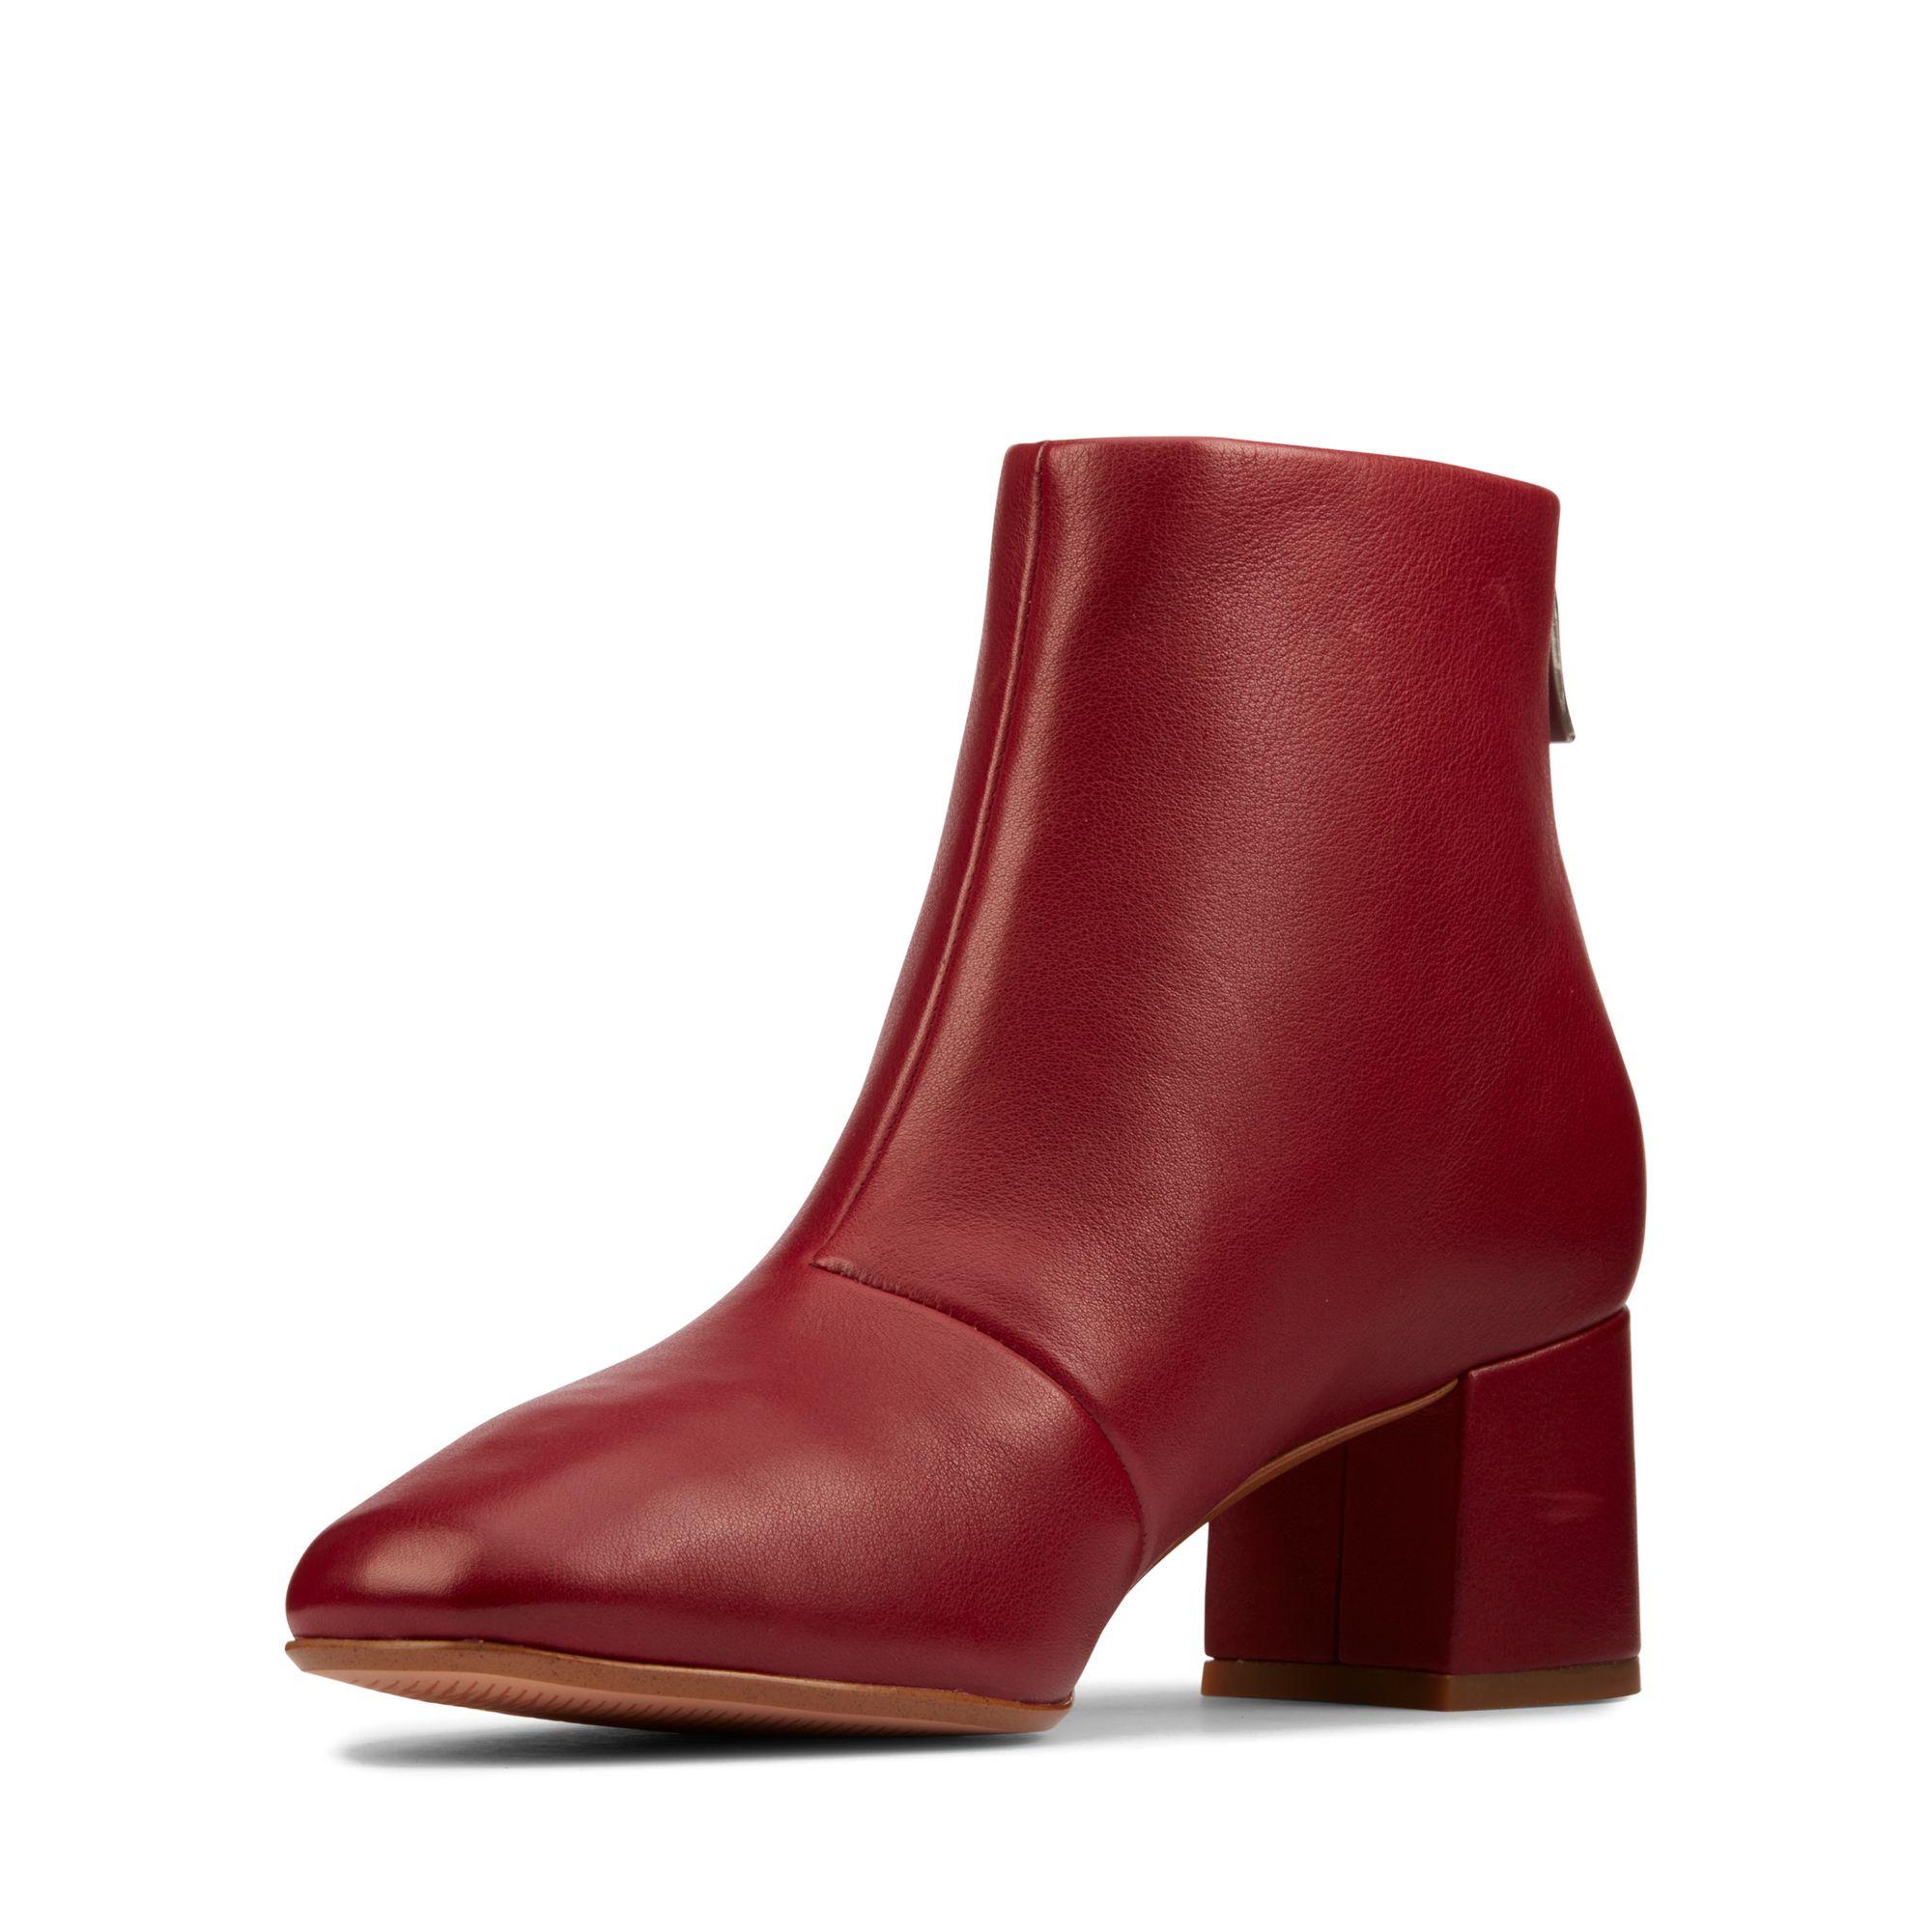 Дамски елегантни боти Clarks Sheer55 Zip Wine Leather червени - снимка 6